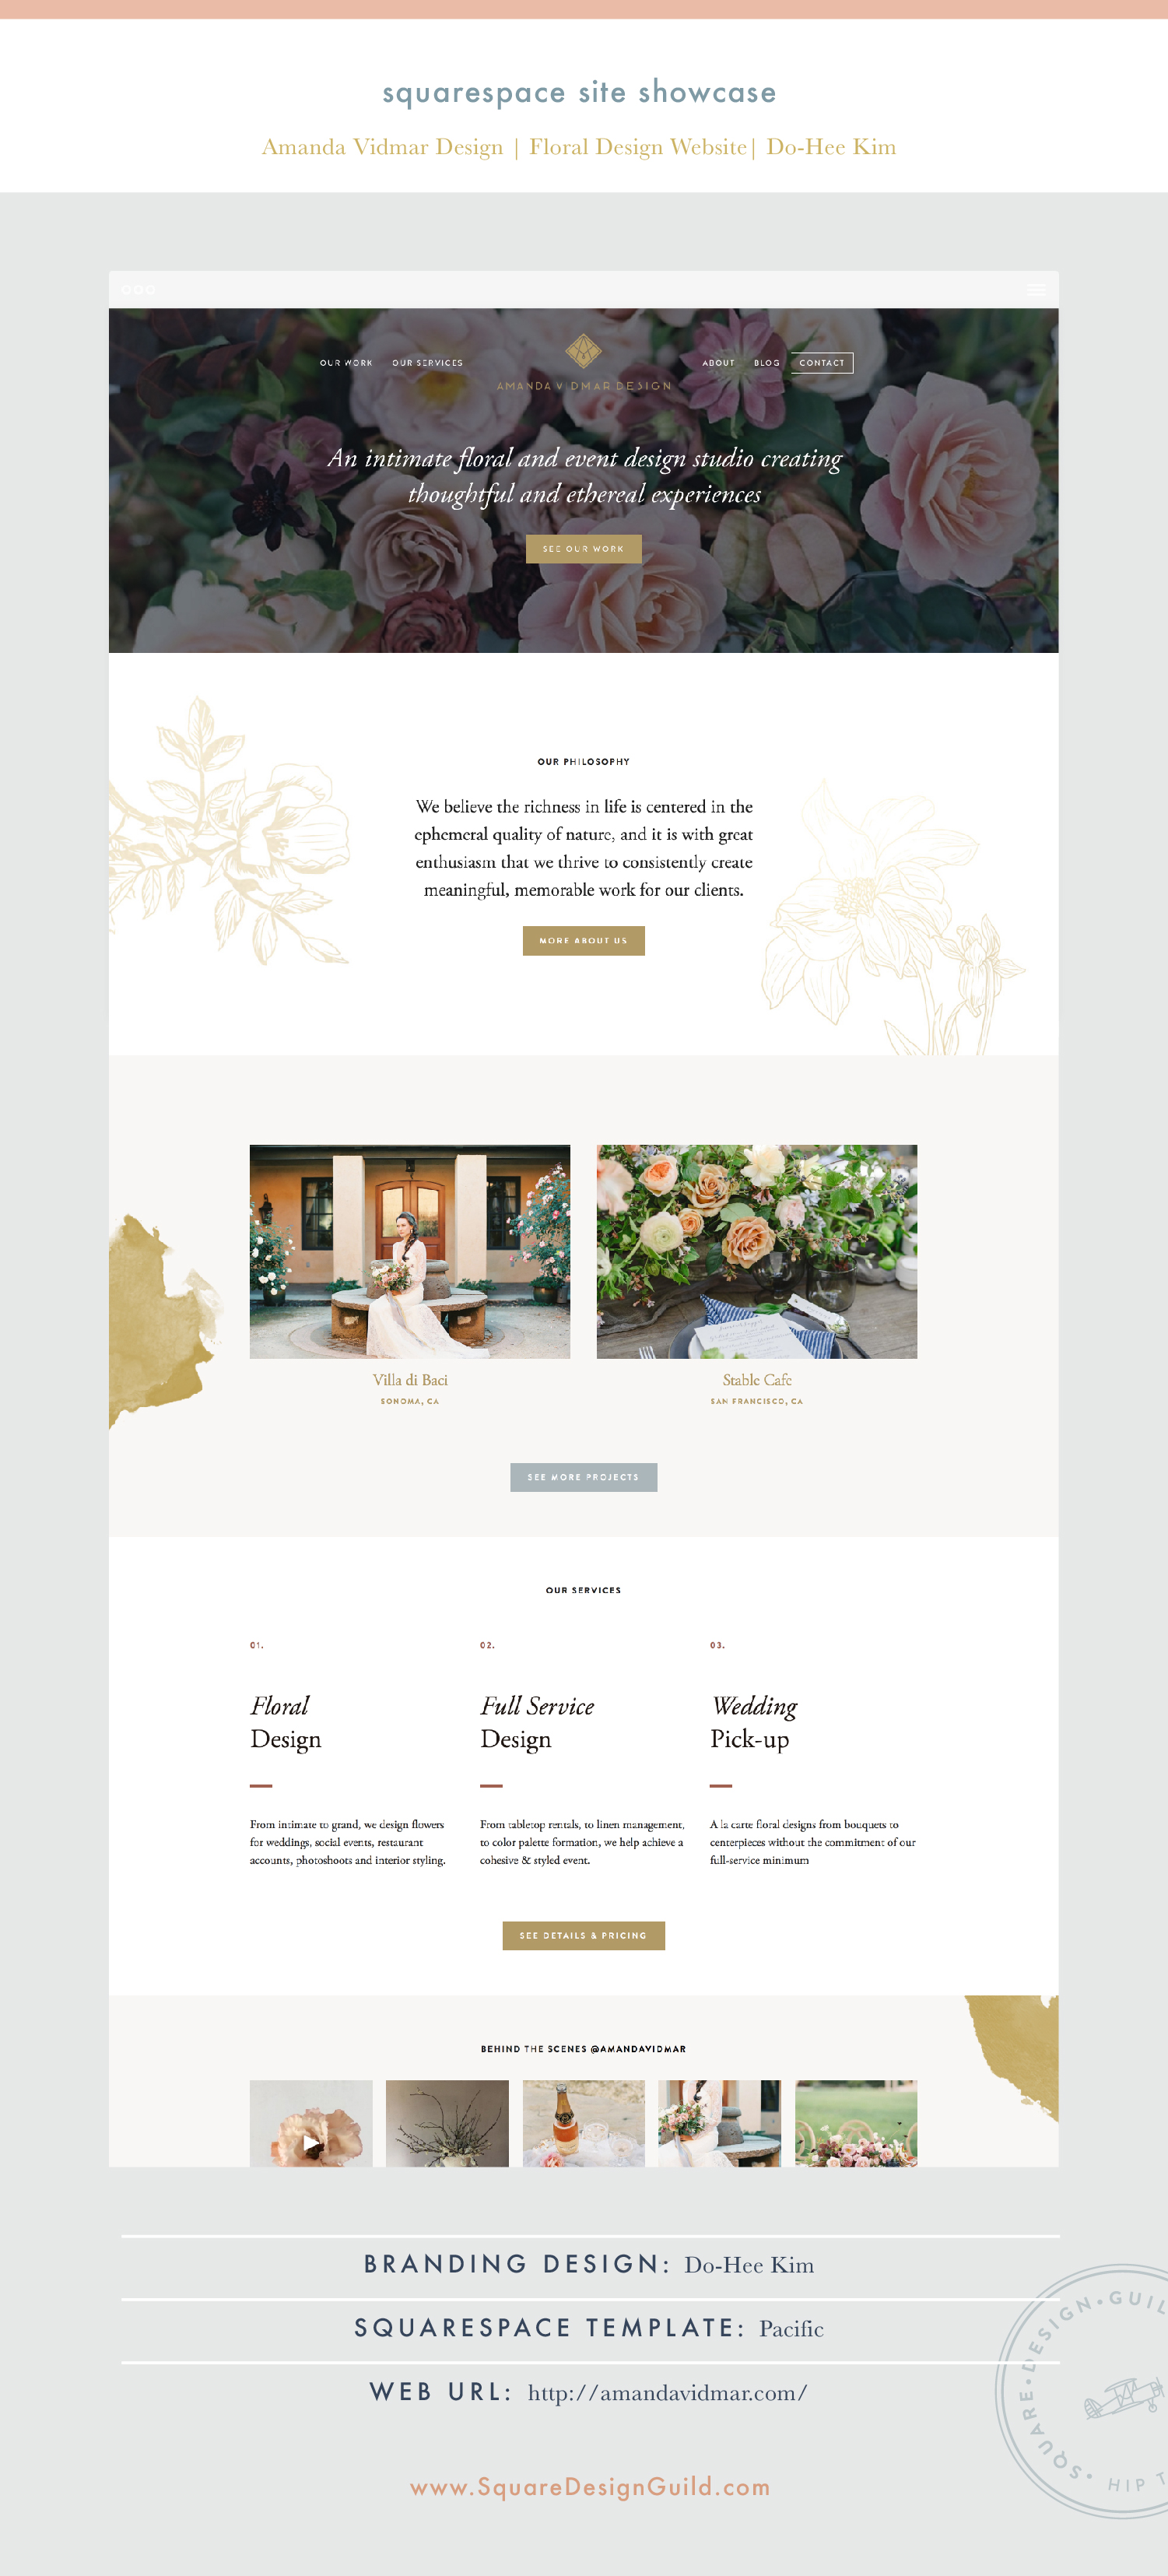 Square Design Guild   Squarespace Site Showcase: Amanda Vidmar Design   Floral Website on Pacific Template